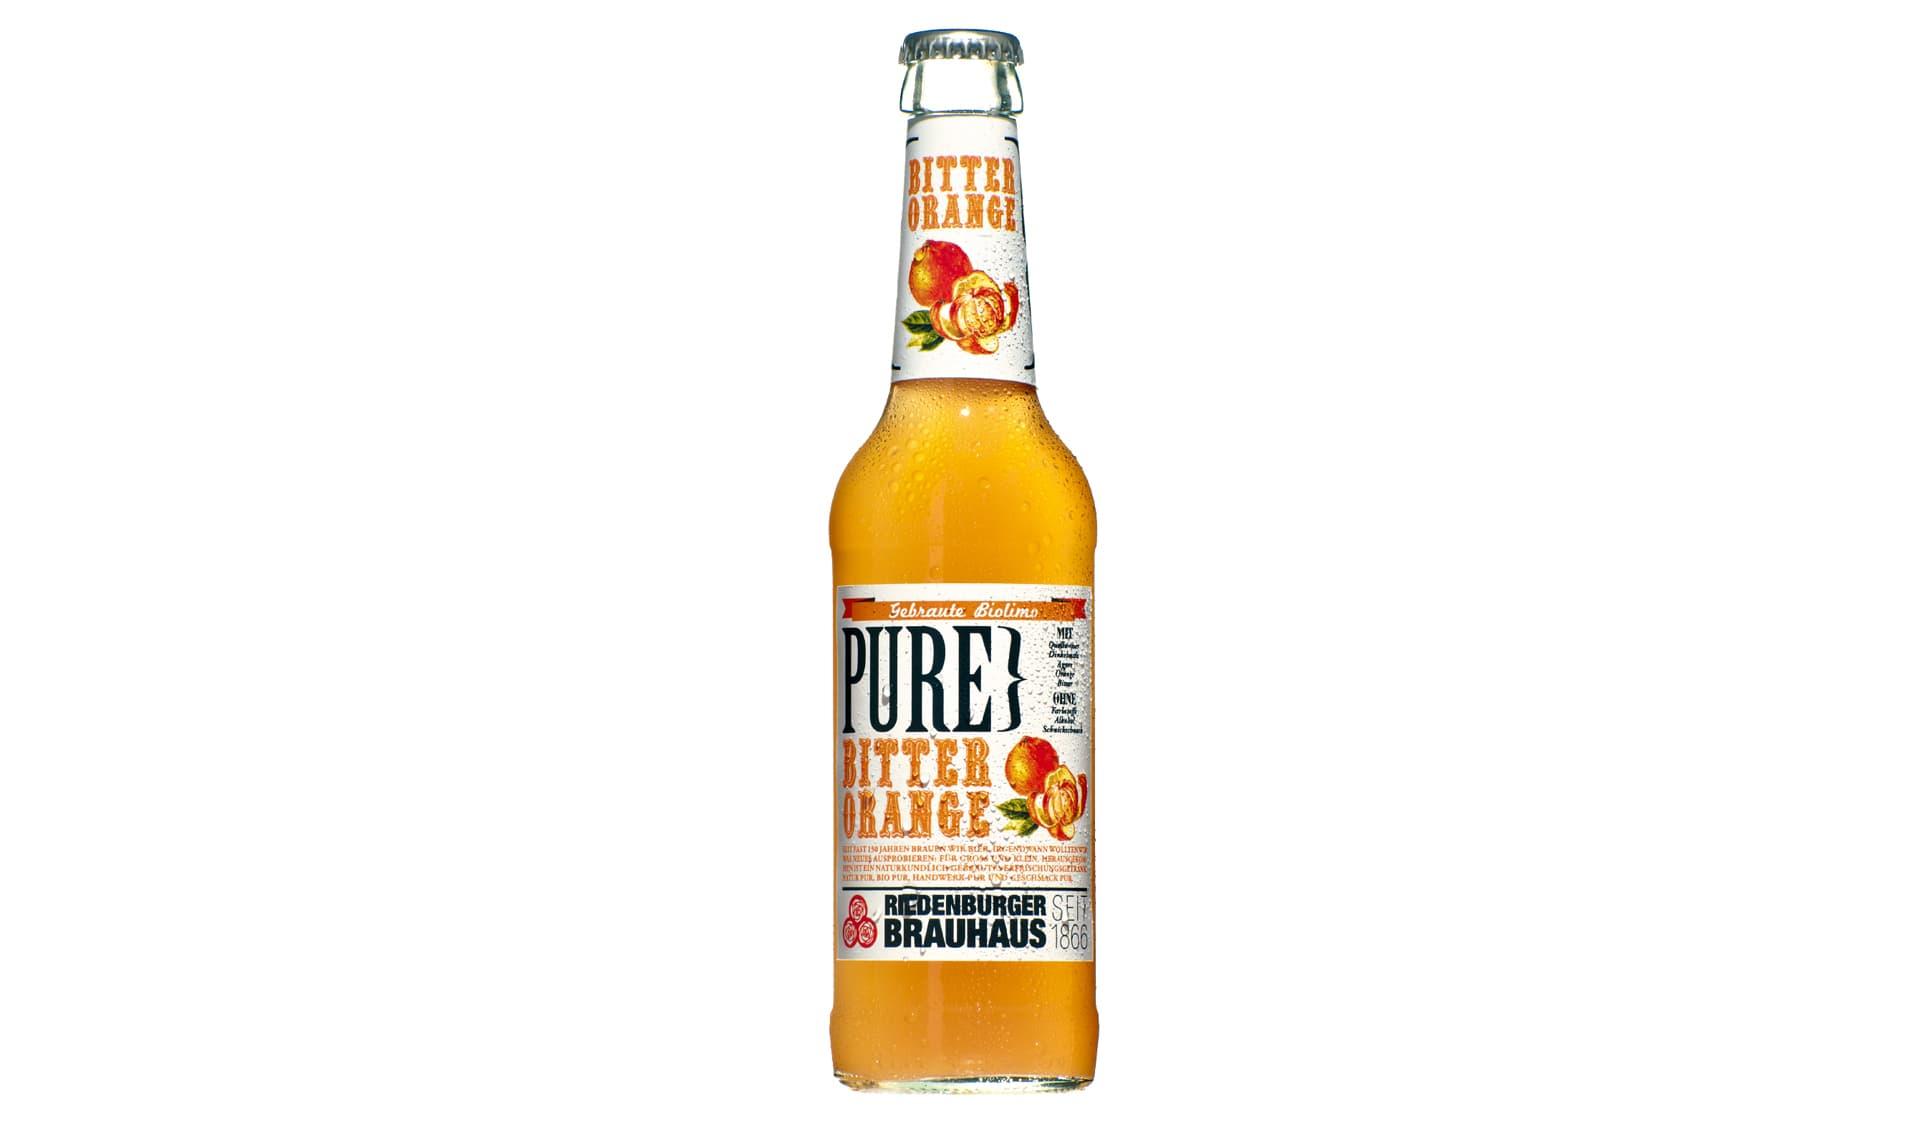 Riedenburger Pure Bitter Orange (www.riedenburger.de)